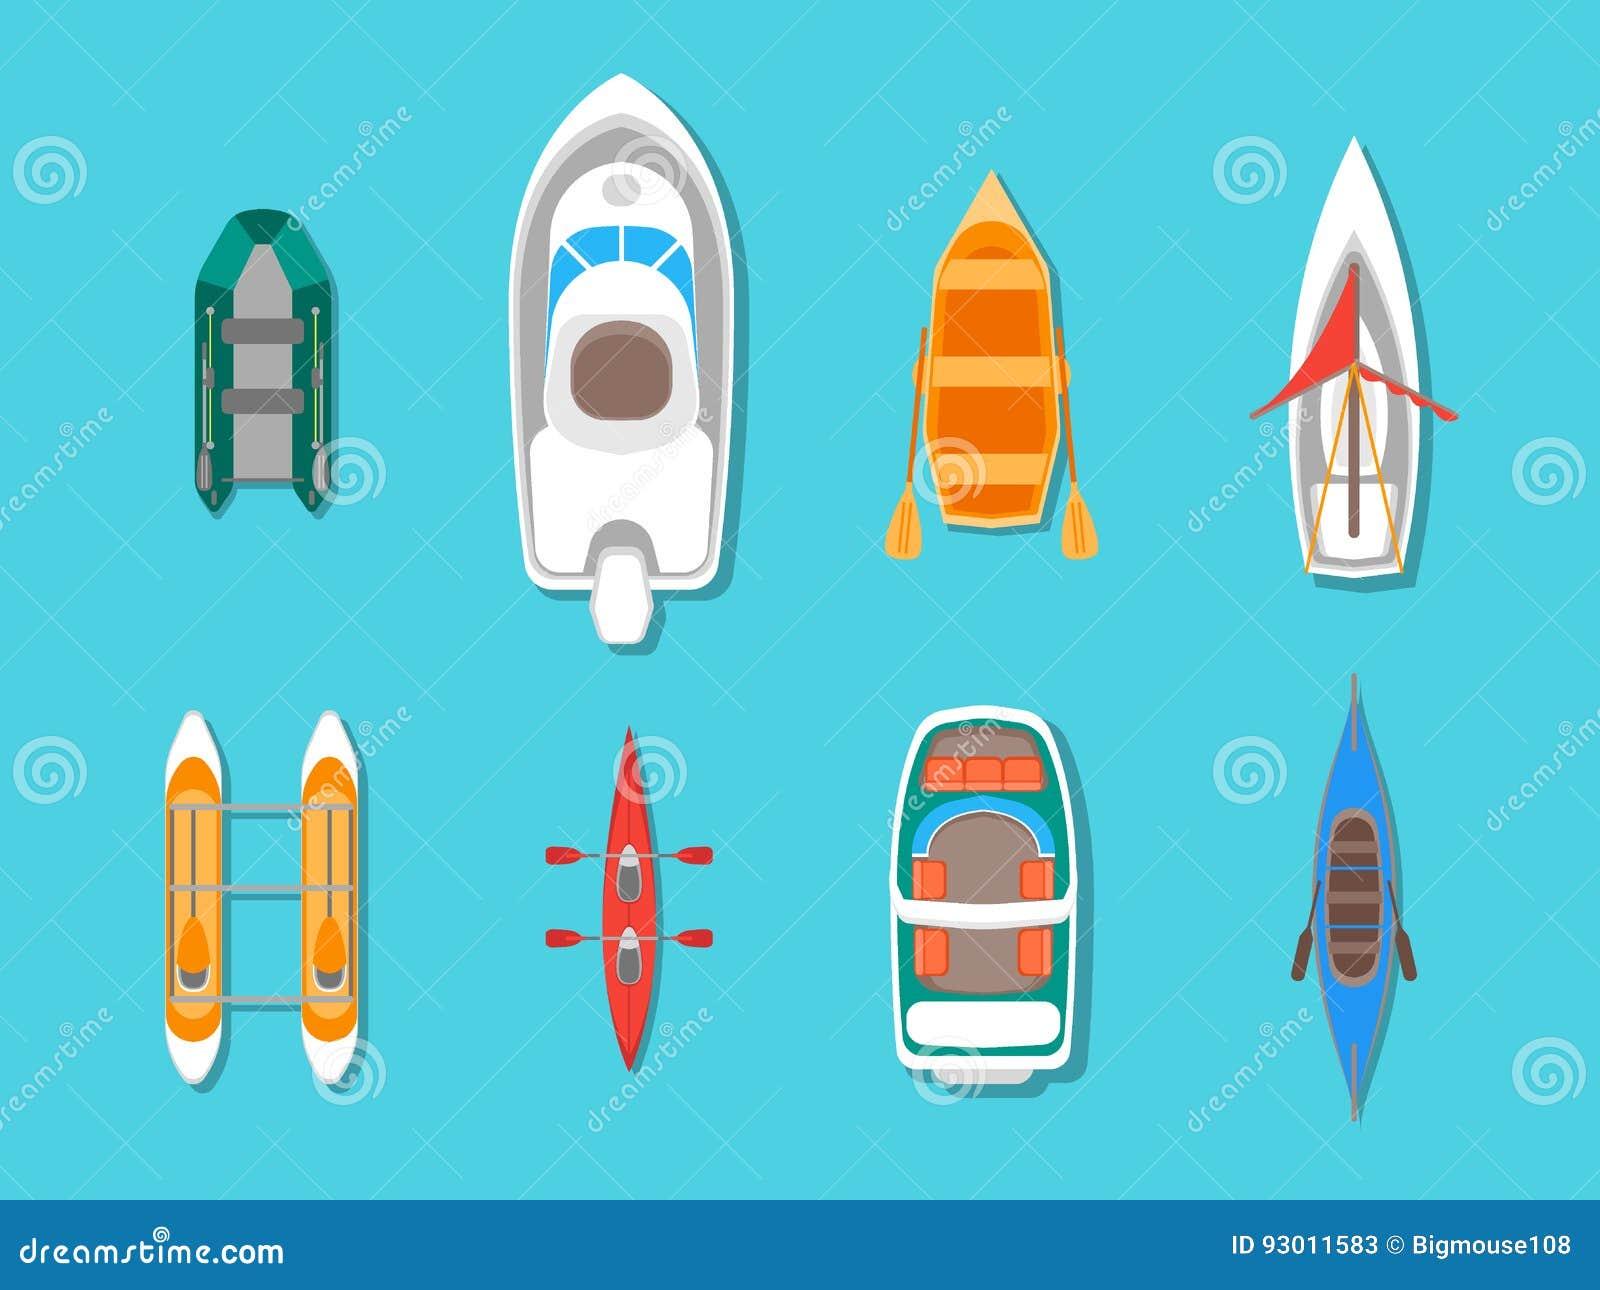 Cartoon Color Boats Icons Set Top View. Vector